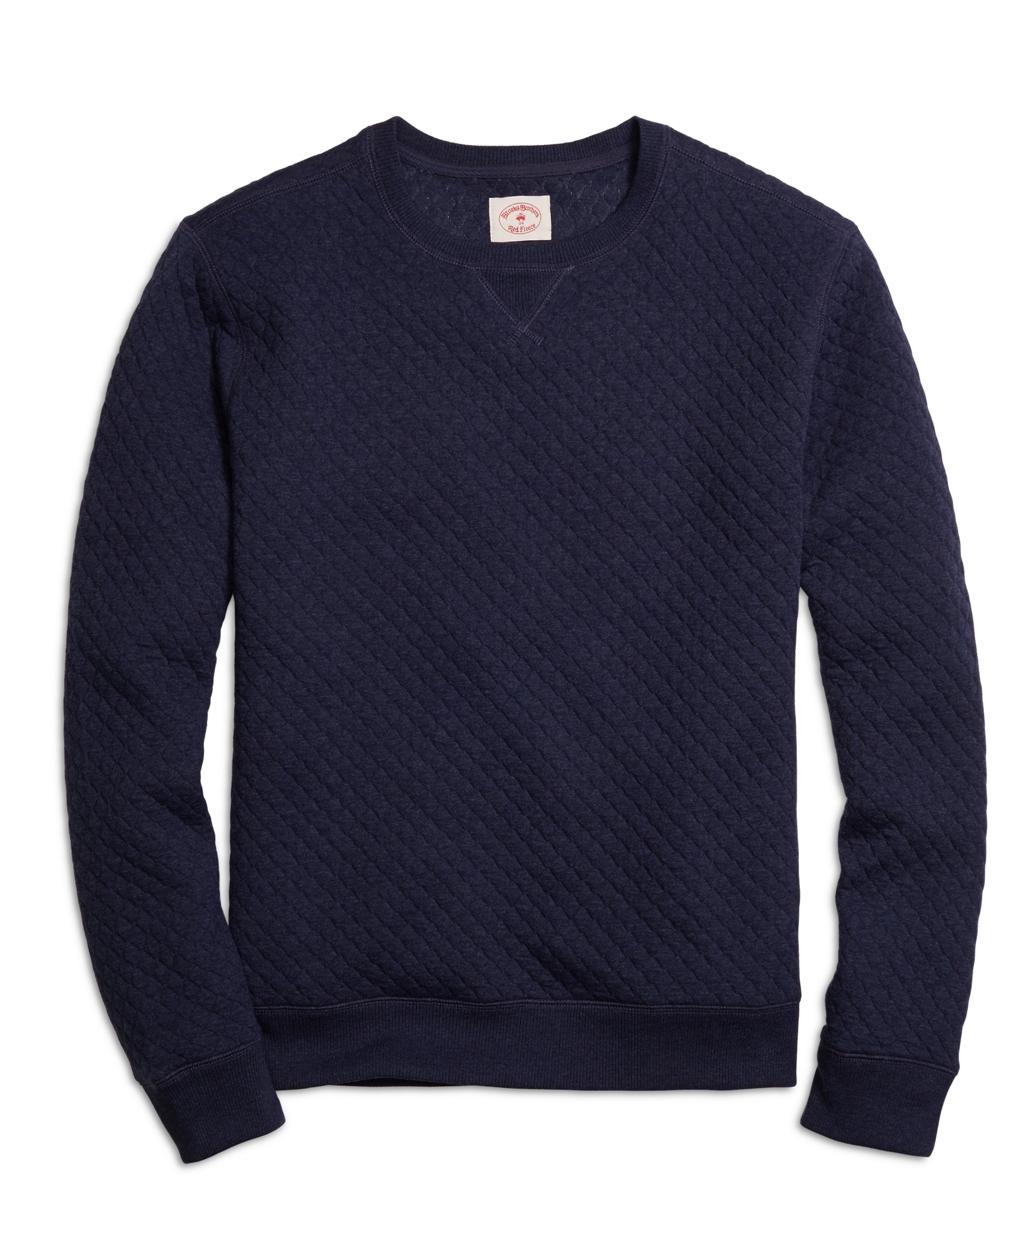 Men's Navy Jacquard Quilted Crewneck Sweatshirt | Brooks Brothers